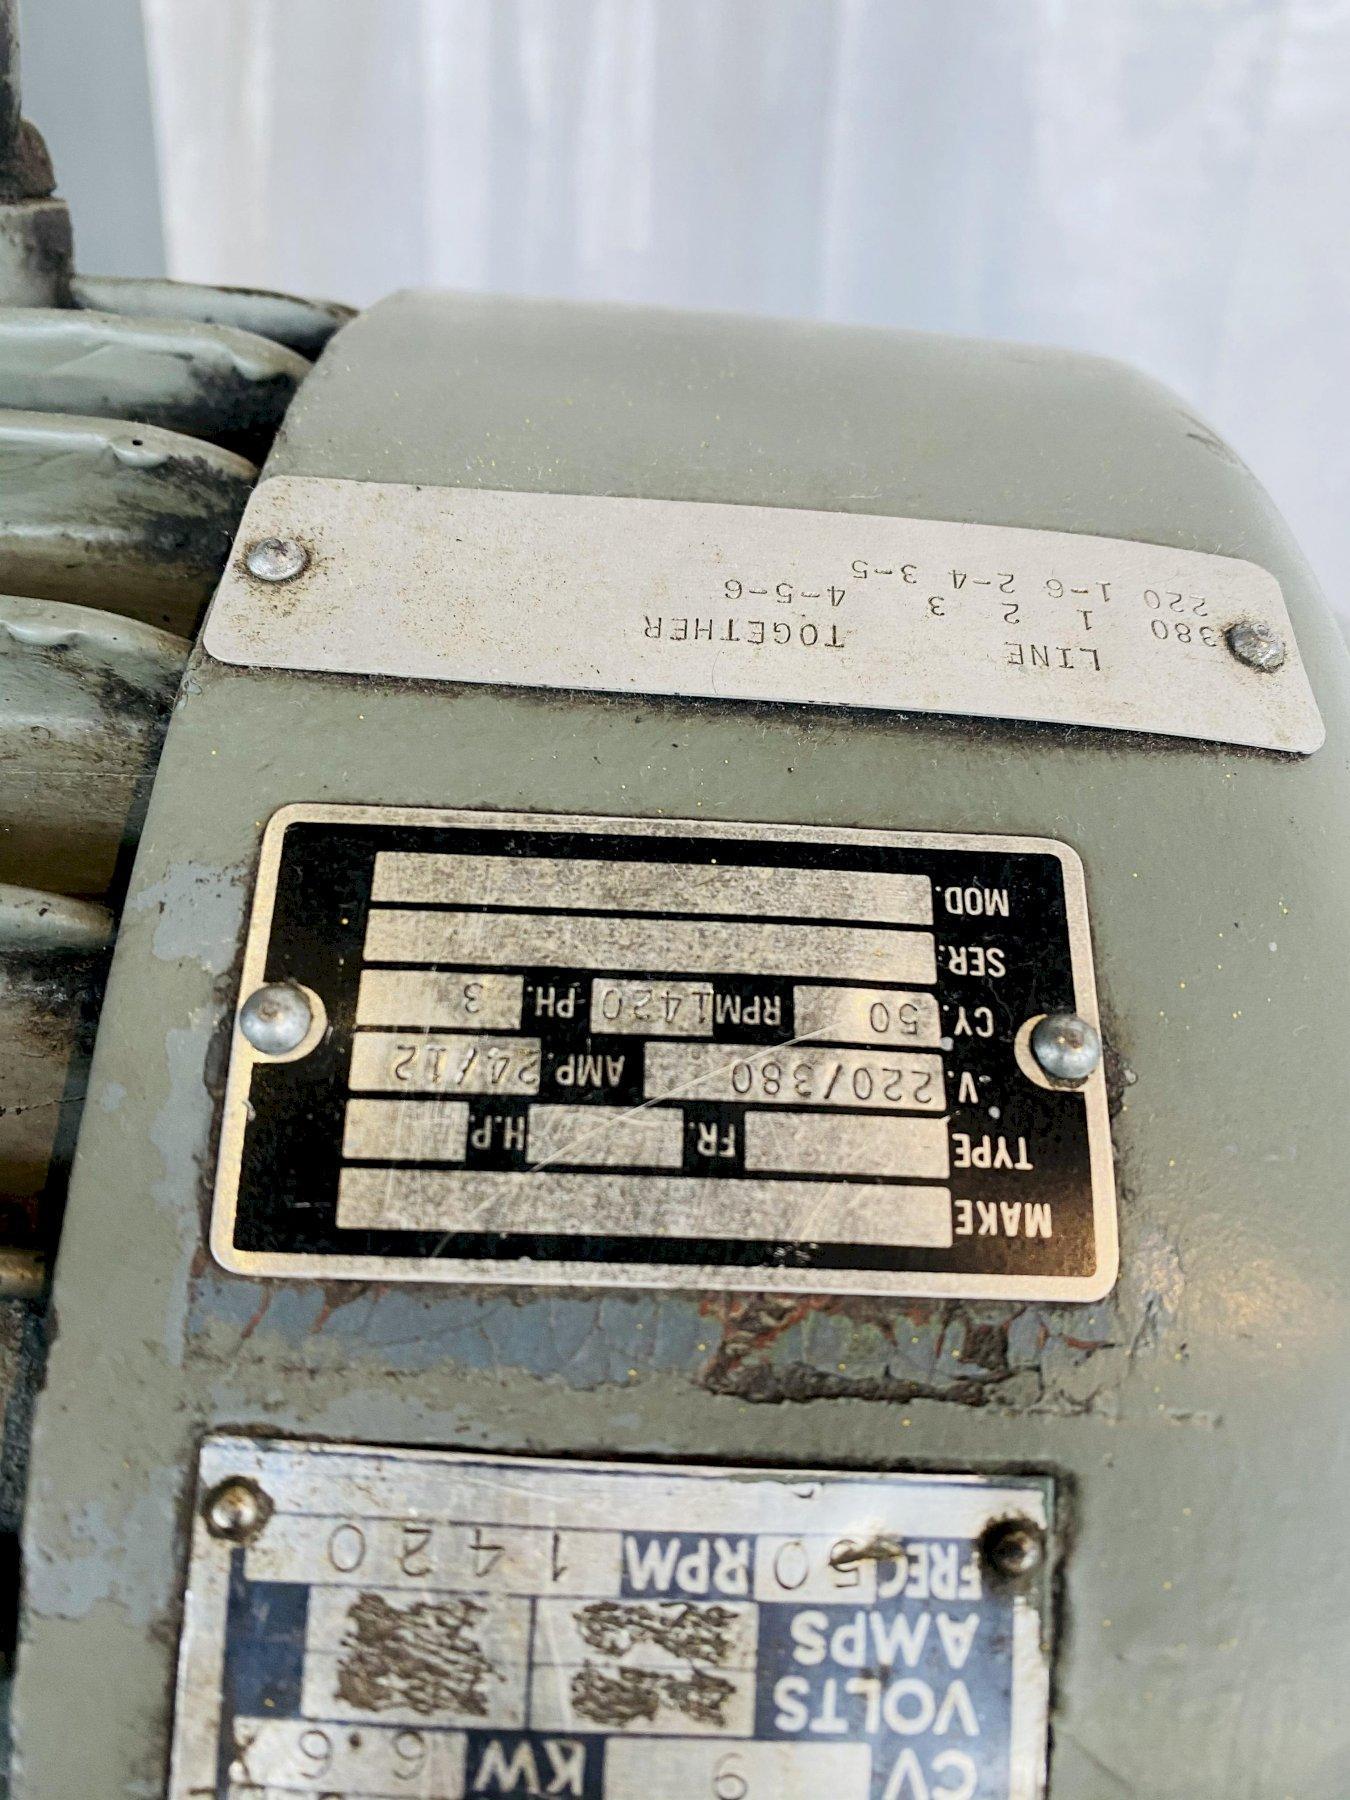 "3"" WOTAN MODEL # B-75 HORIZONTAL BORING MILL. (BUILT IN ROTARY) STOCK # 0951020"